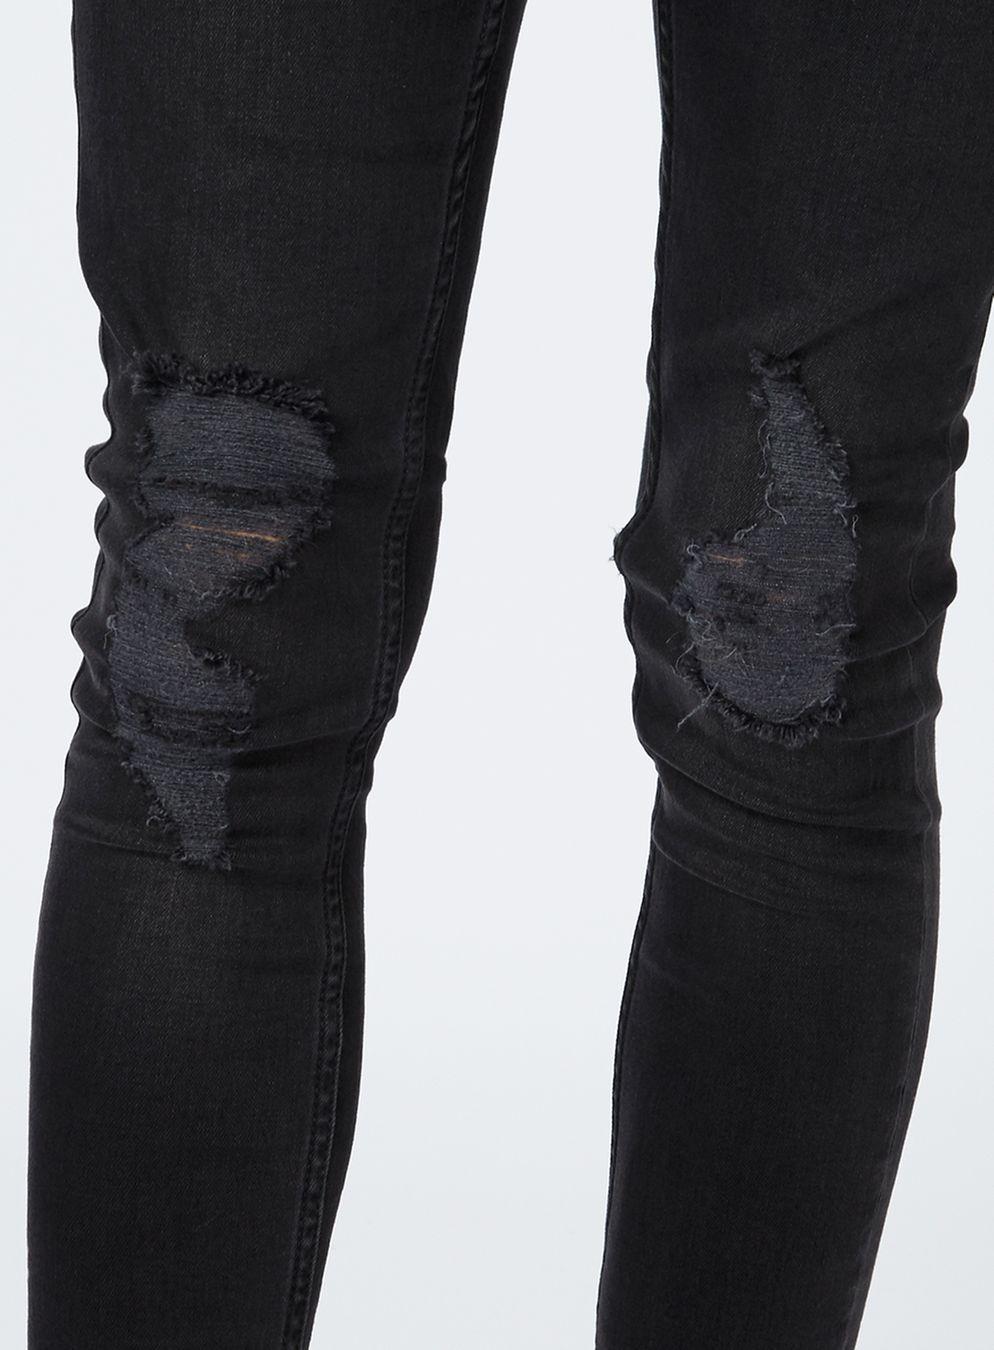 black ripped skinny jeans washed black ripped spray on skinny jeans - topman usa SITAJNI